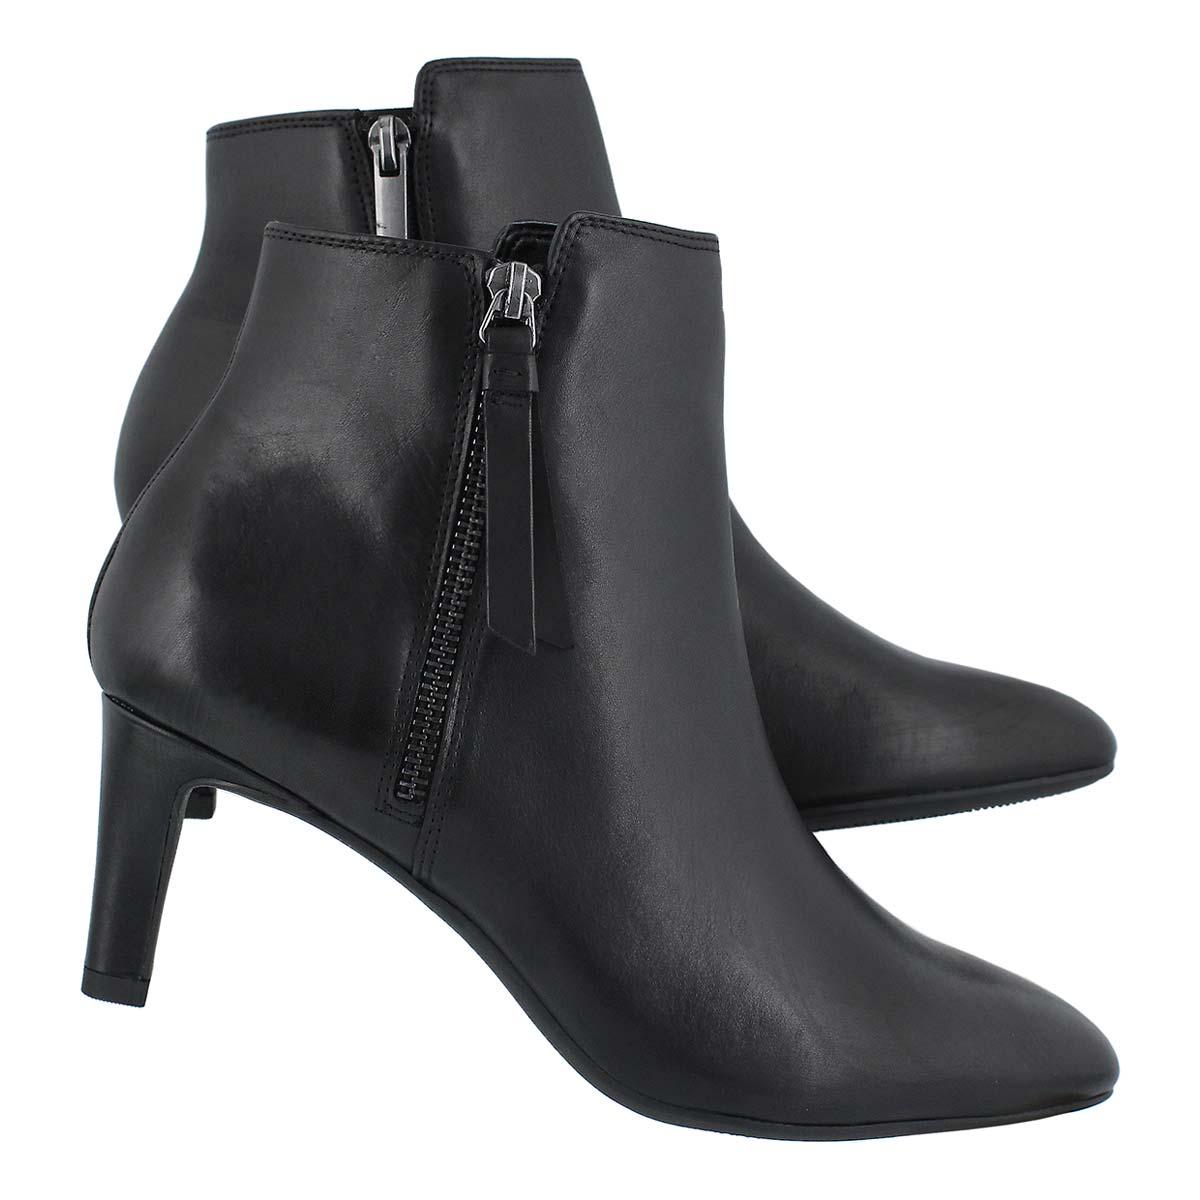 Lds Calla Blossom black dress bootie